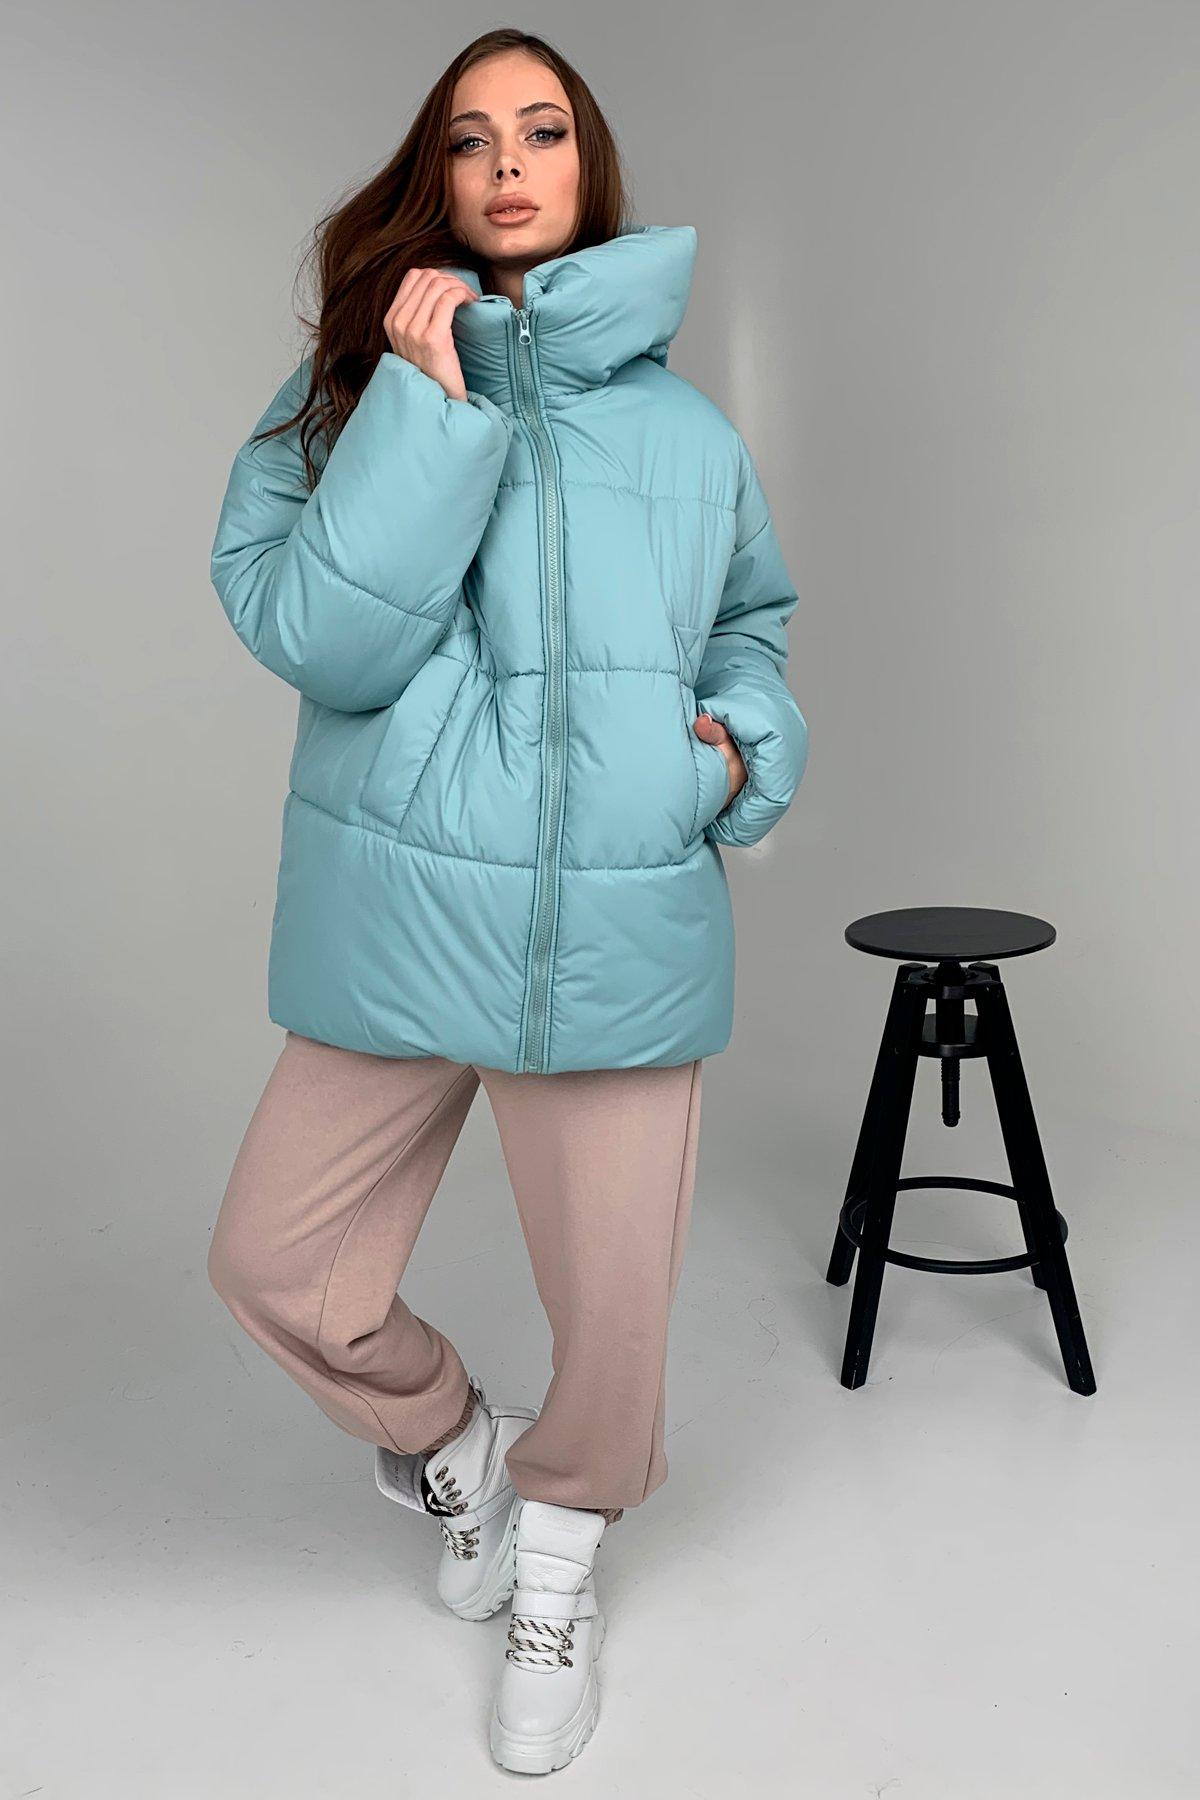 Овертайм  теплый пуховик из плащевой ткани 10243 АРТ. 46535 Цвет: Олива 756 - фото 8, интернет магазин tm-modus.ru